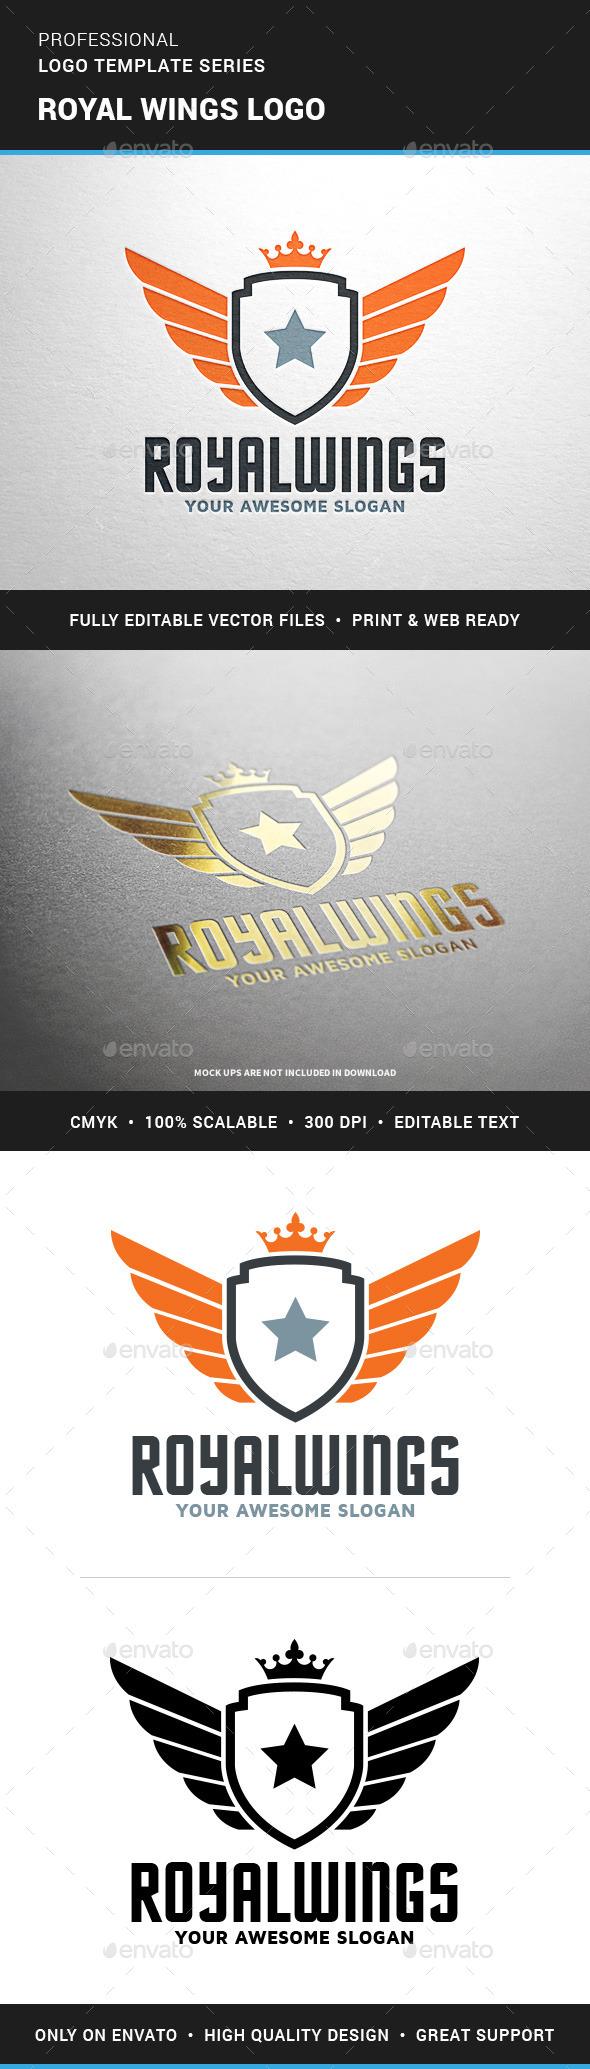 Royal Wings Logo Template